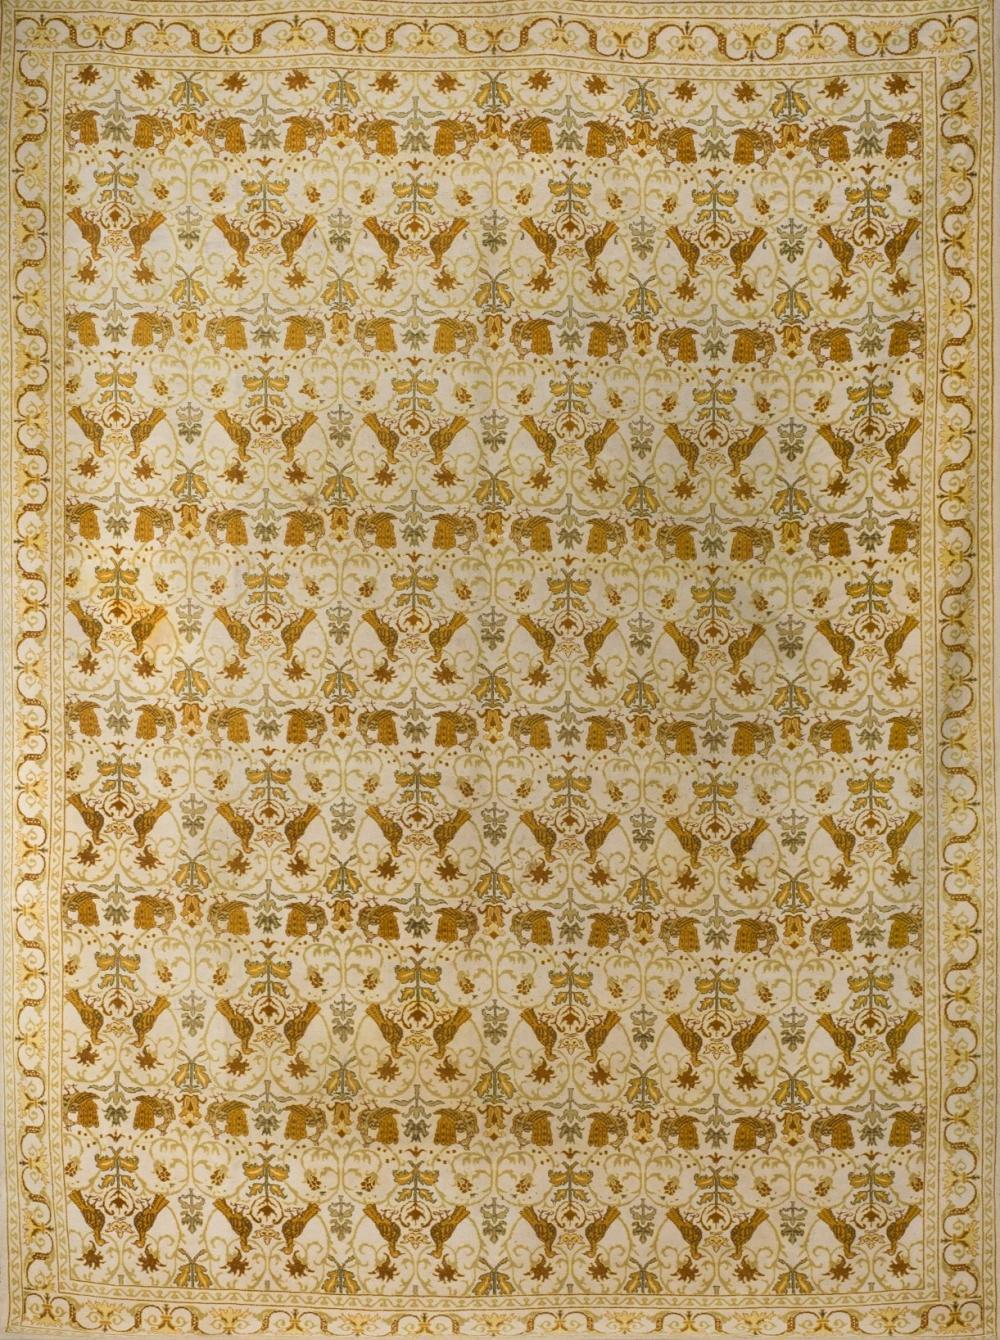 A wool carpet whit birds. 20th Century